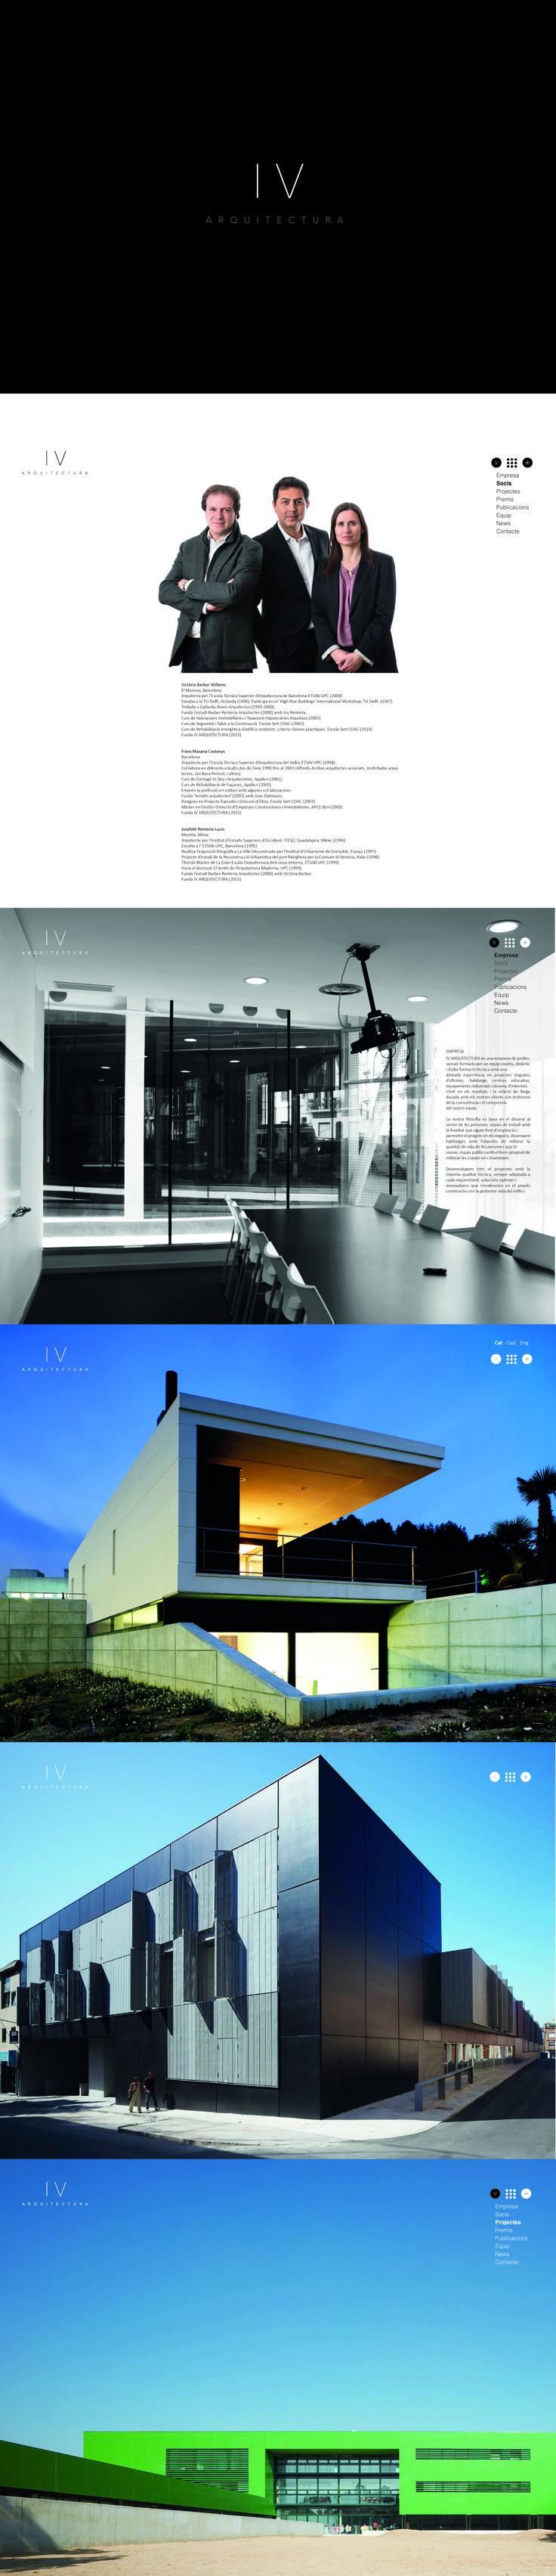 Nova web: www.IVarquitectura.com